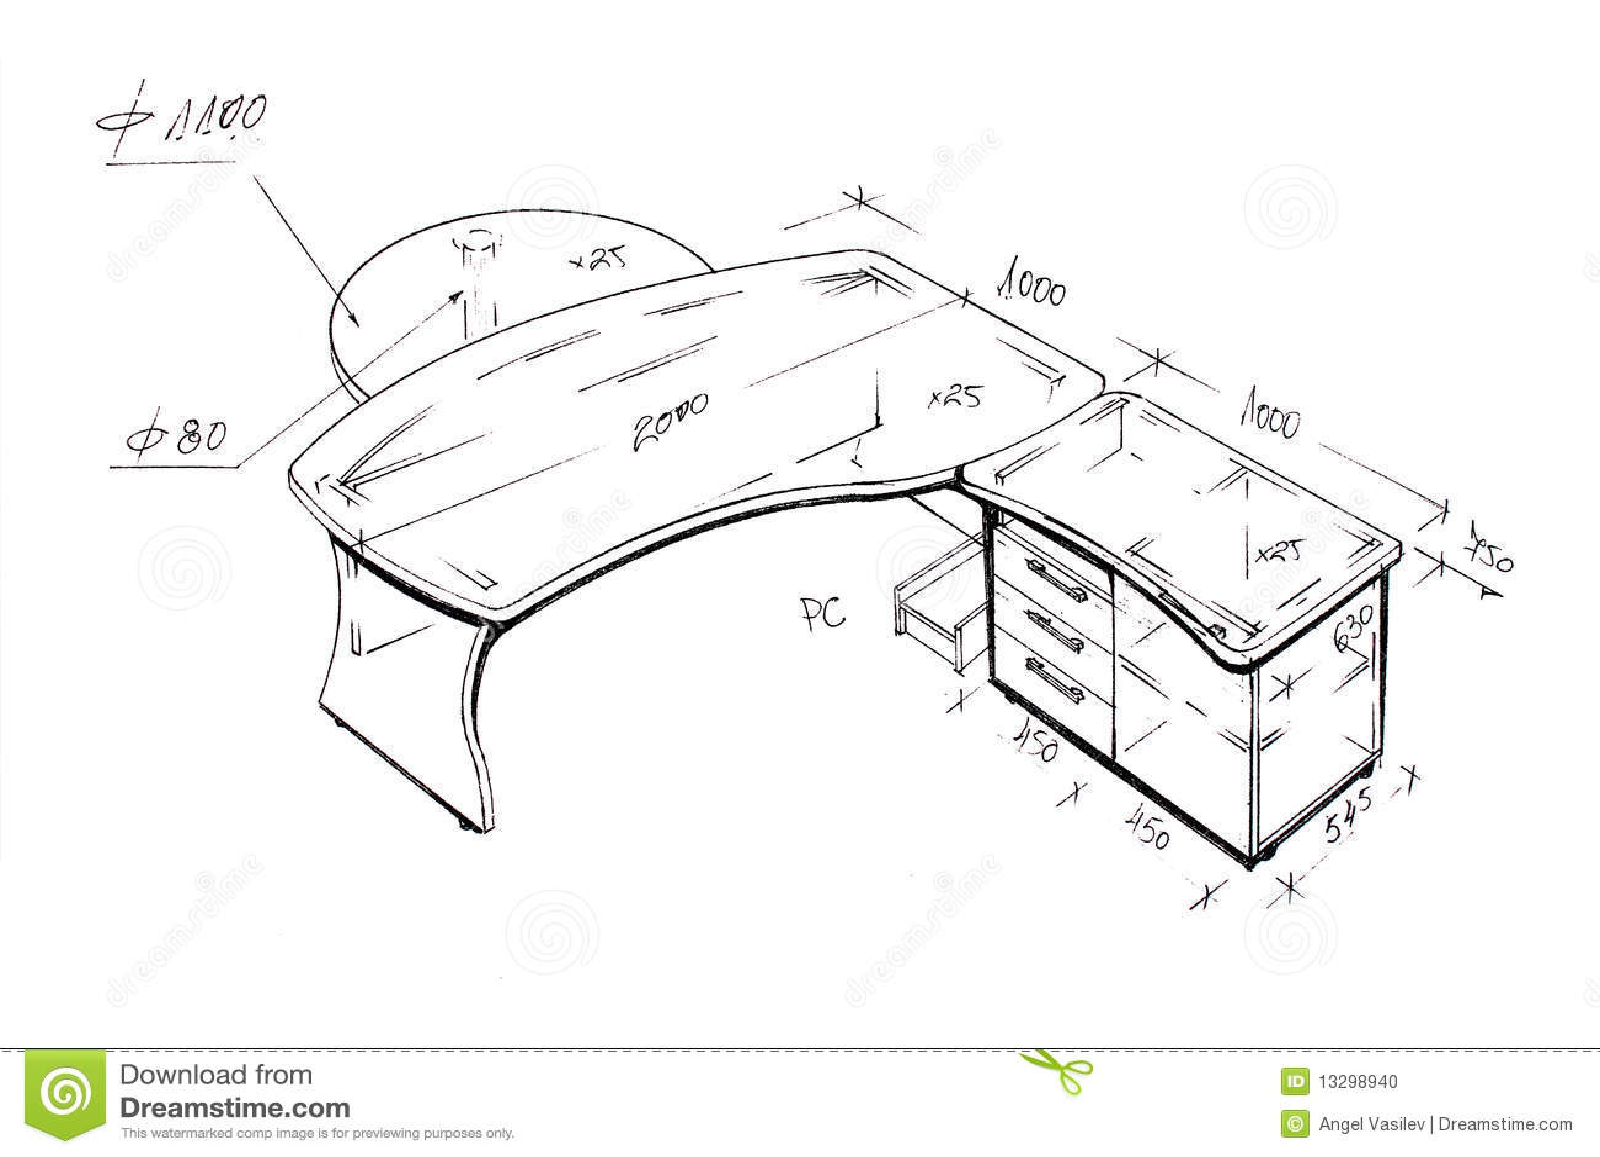 Gr fico a pulso del escritorio moderno del dise o interior for Escritorios para oficina dimensiones